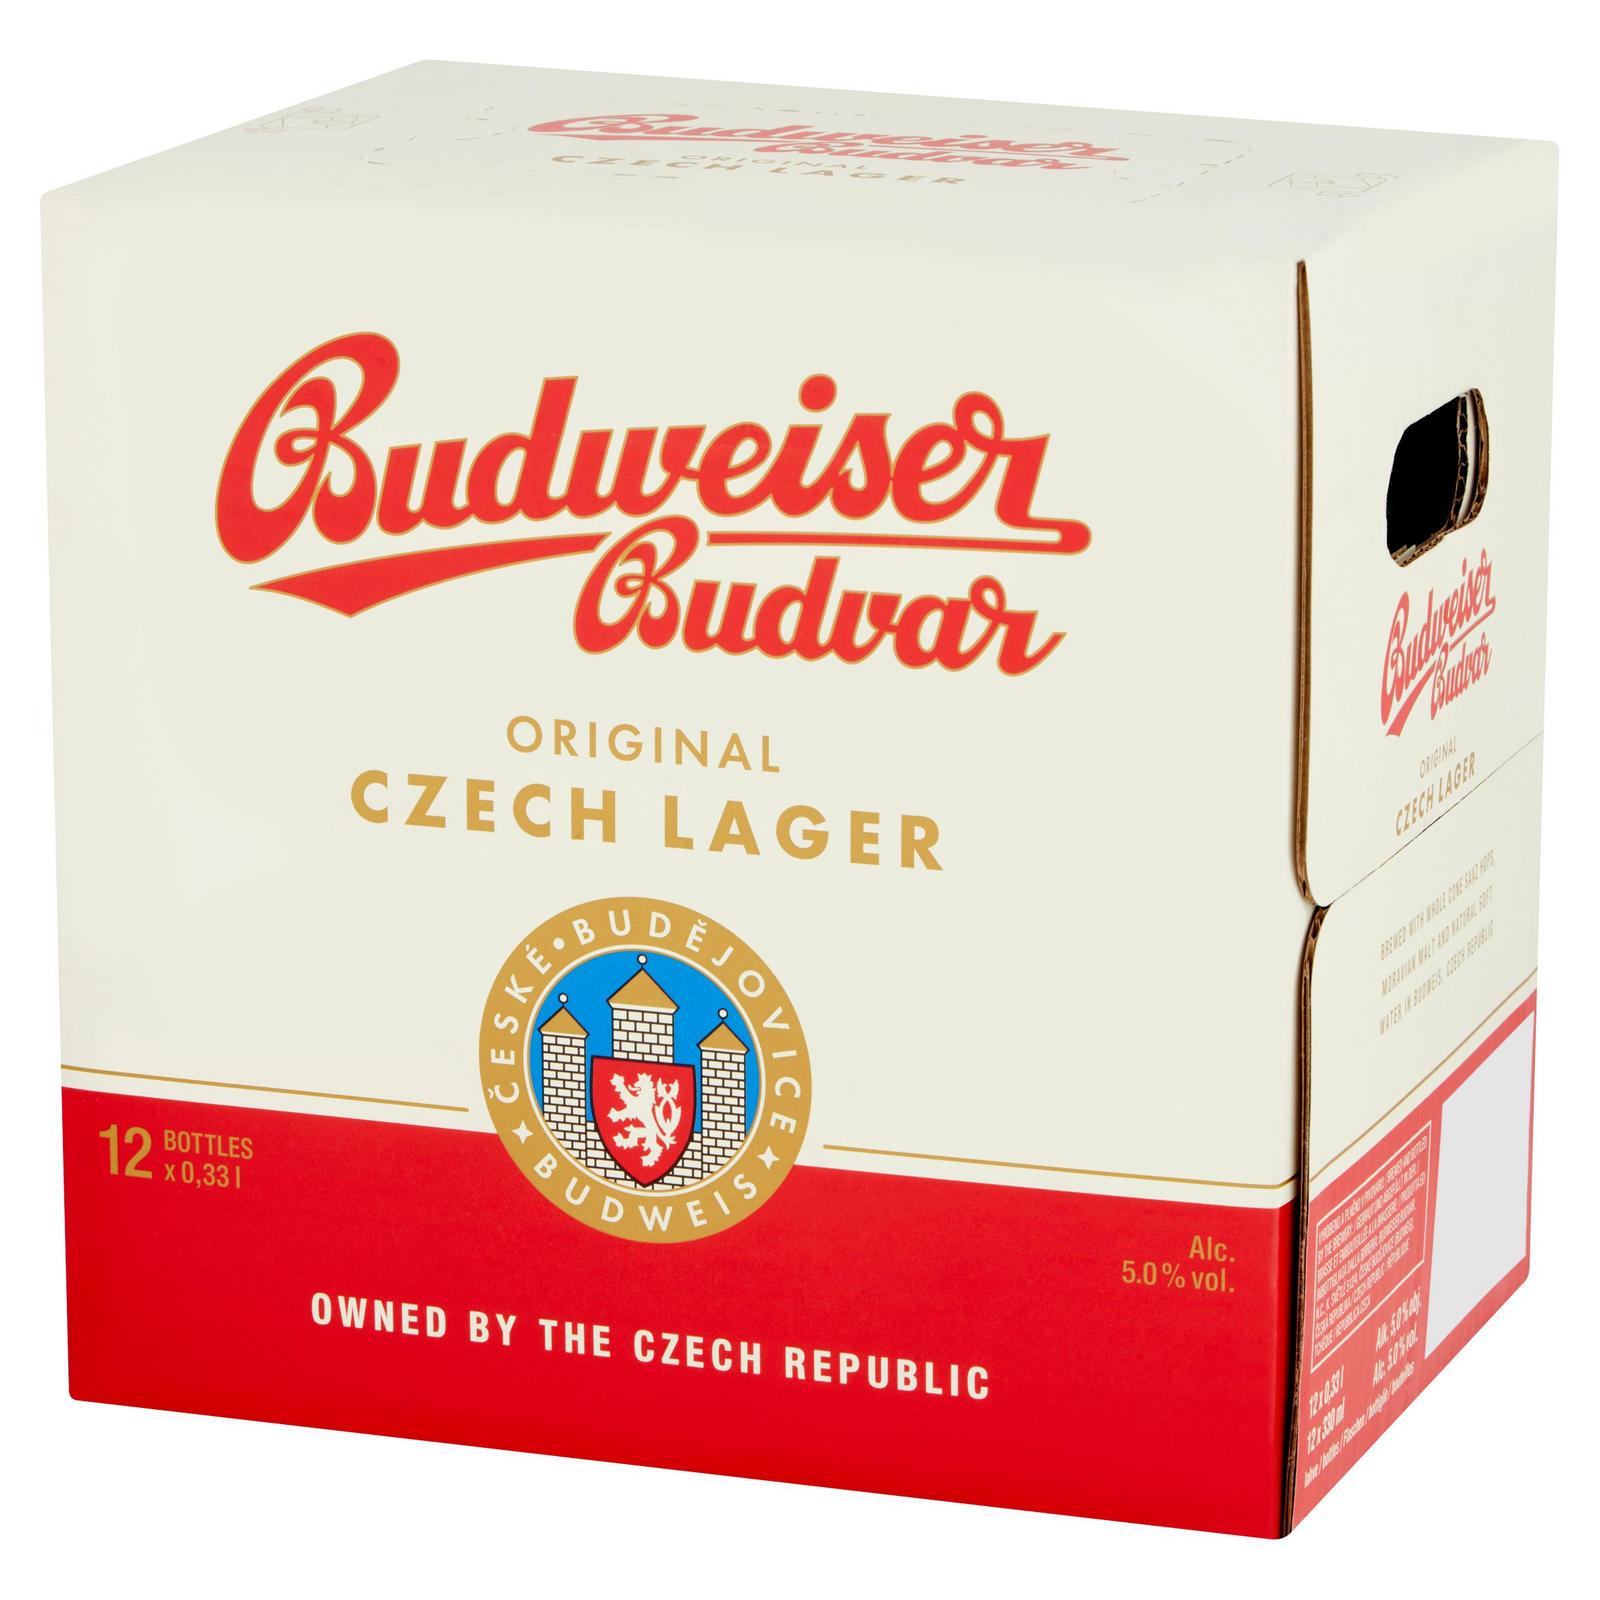 Budweiser Budvar 12 x 330ml - £11.99 instore @ Aldi, Leicestershire